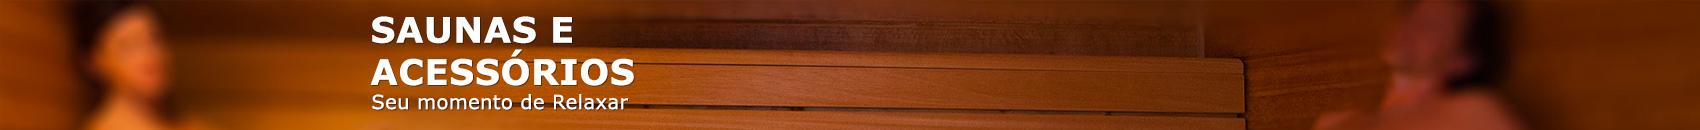 Acessórios para saunas a vapor